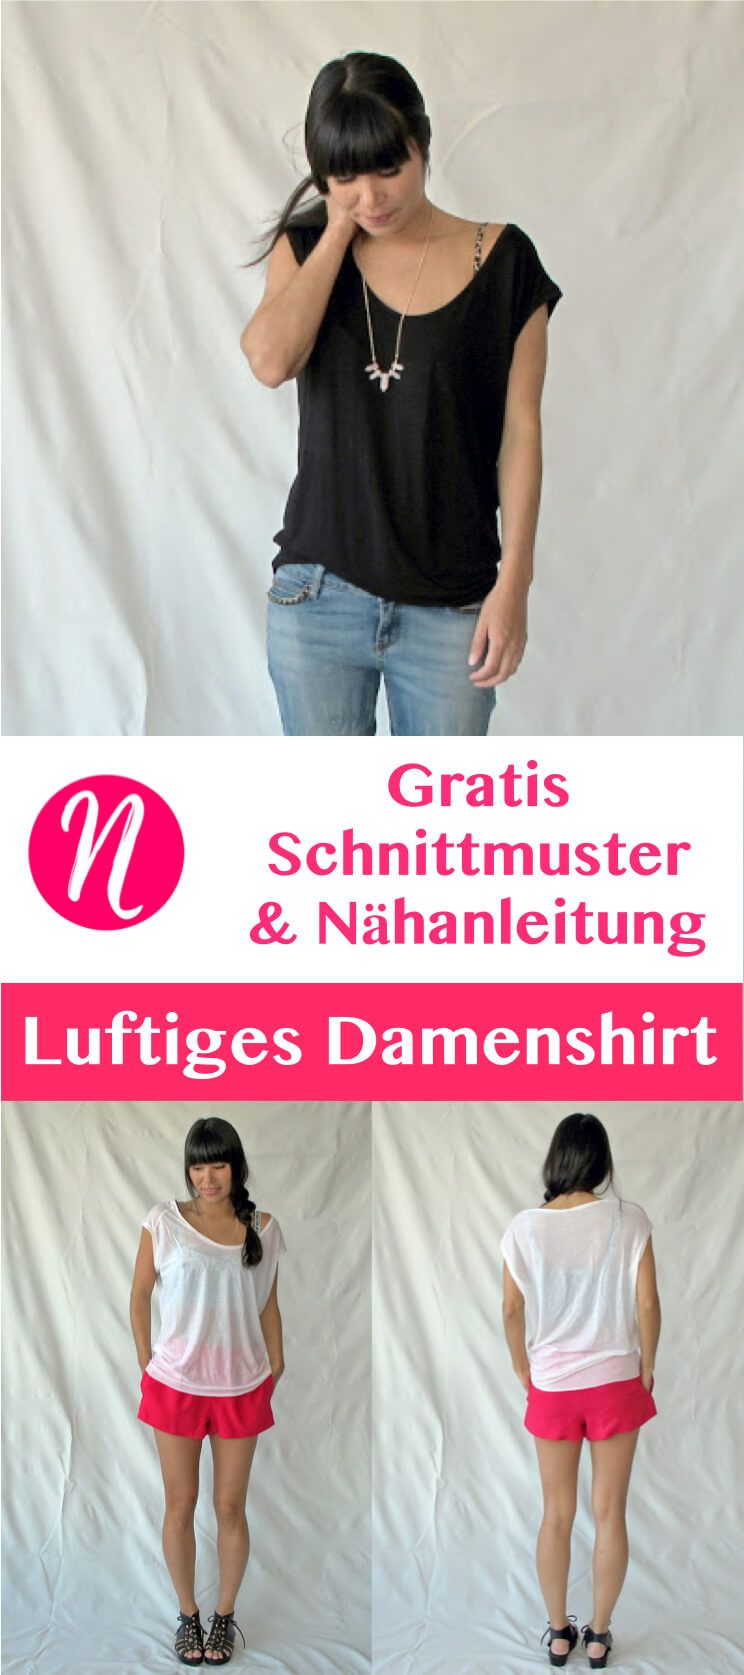 Das Elise-T-Shirt für Damen | Tiefer ausschnitt, Gratis ...